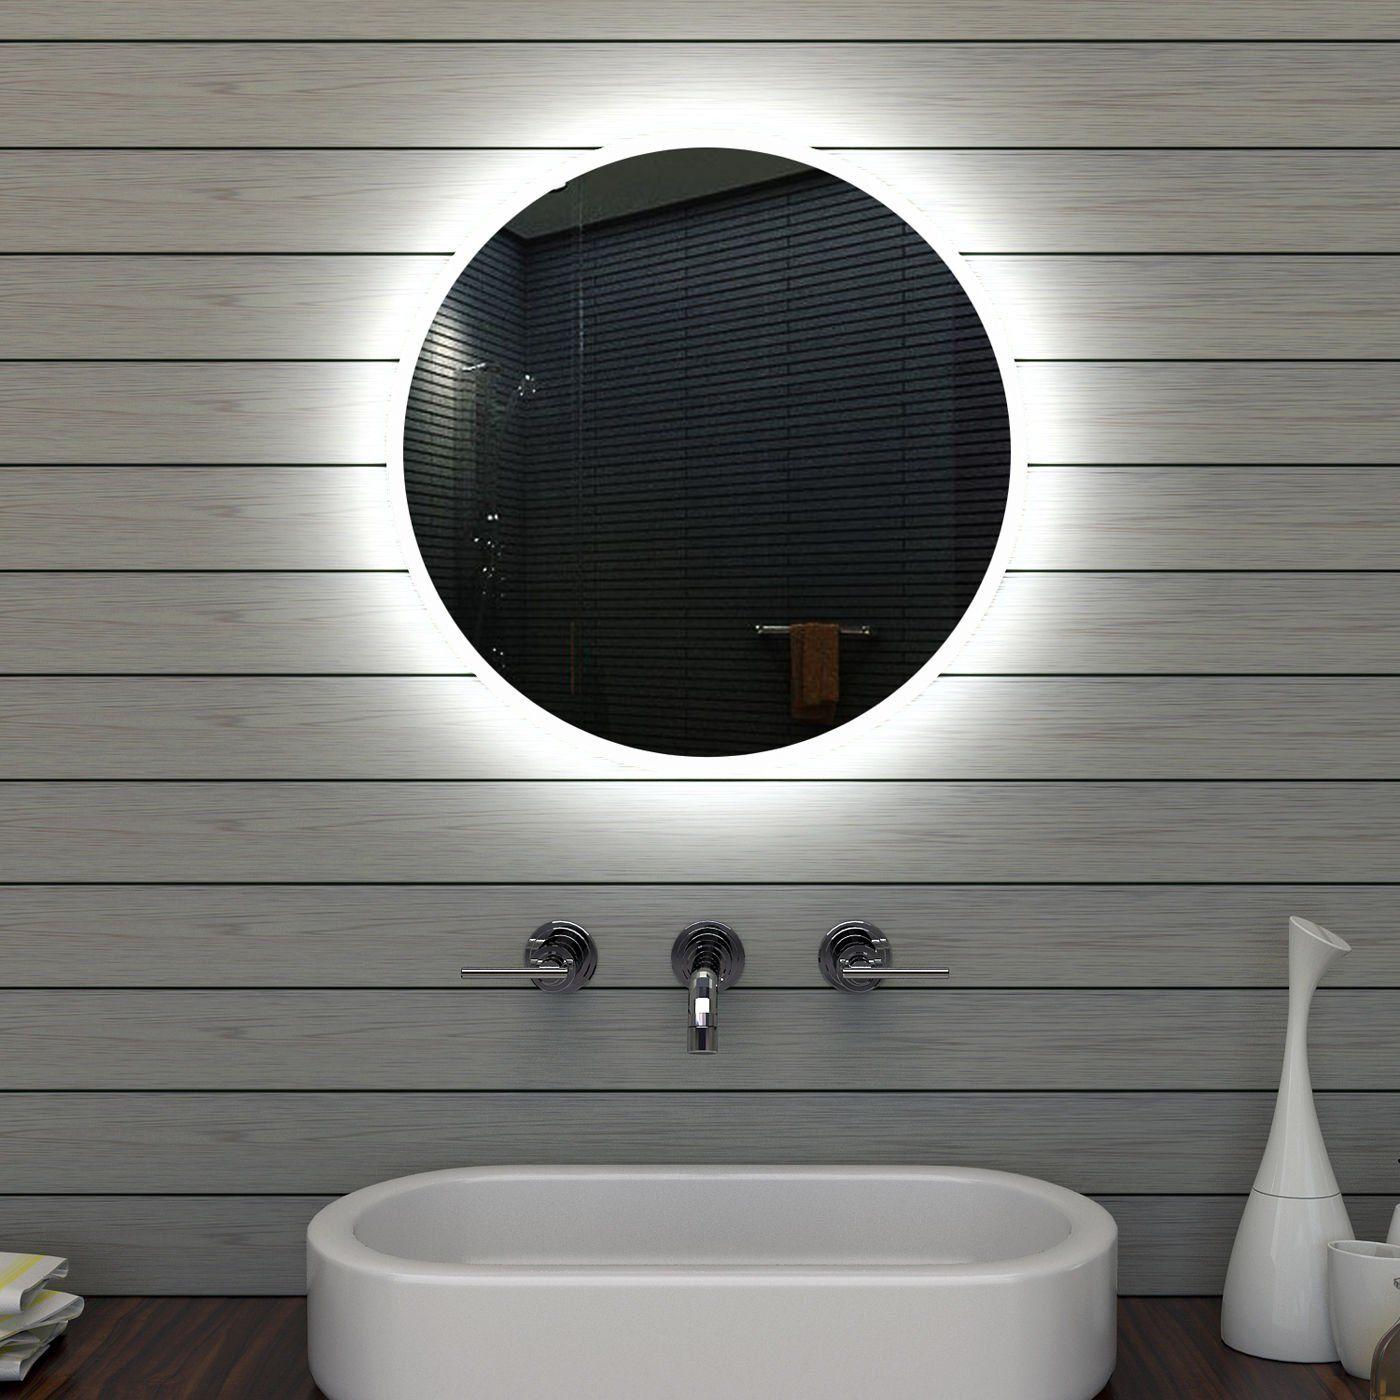 Badezimmerspiegel Badspiegel Wandspiegel LED Beleuchtung ...